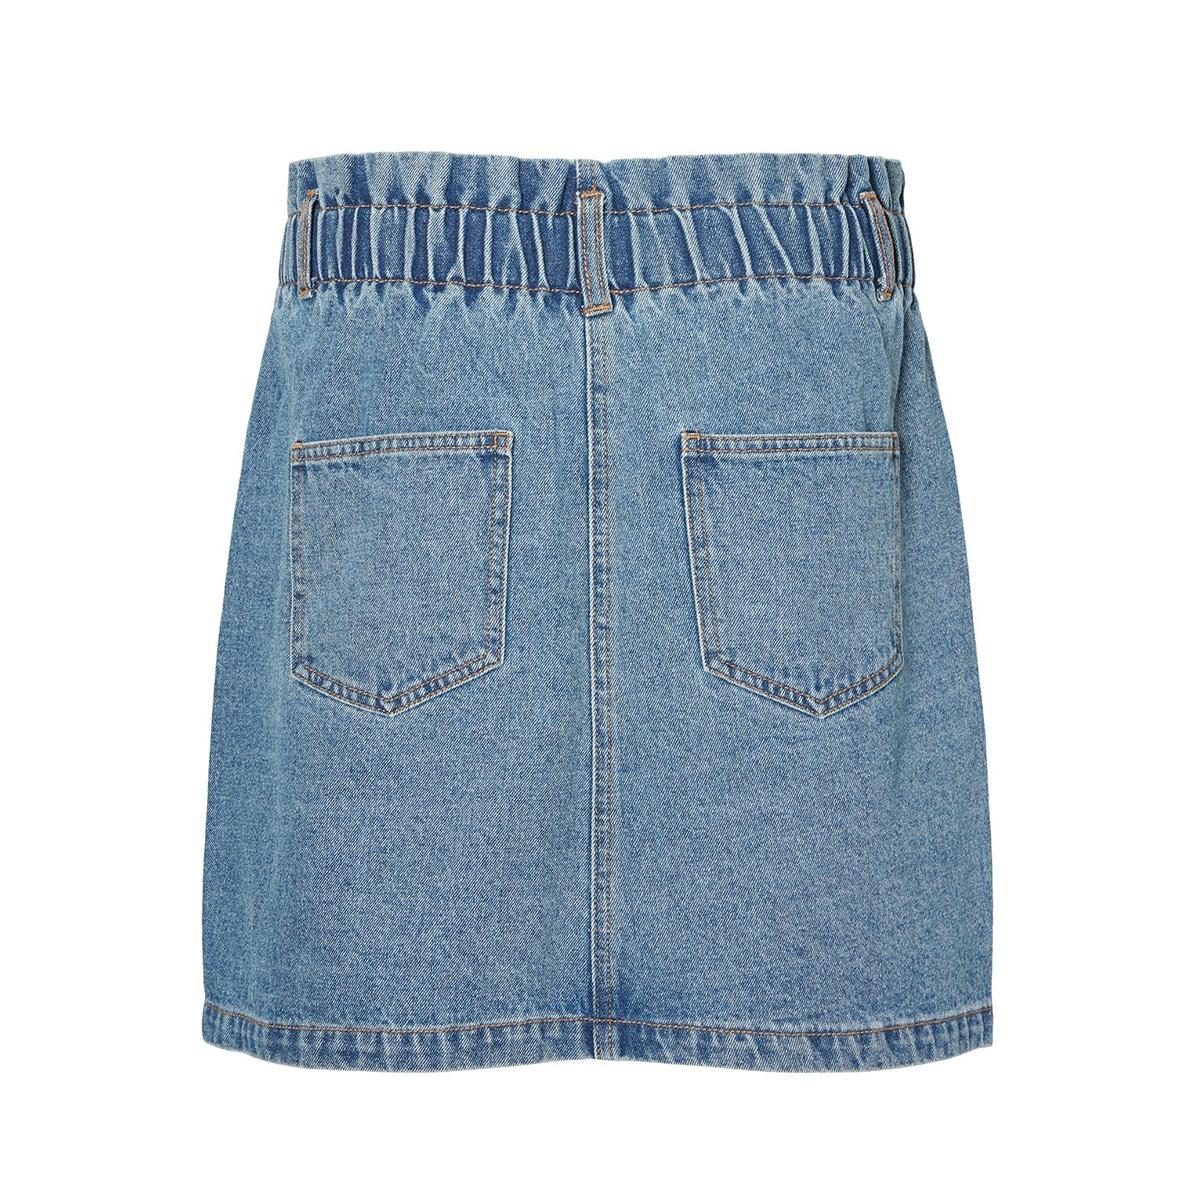 nmjudo hw papback skirt jt090mb bg 27010911 noisy may rok medium blue denim